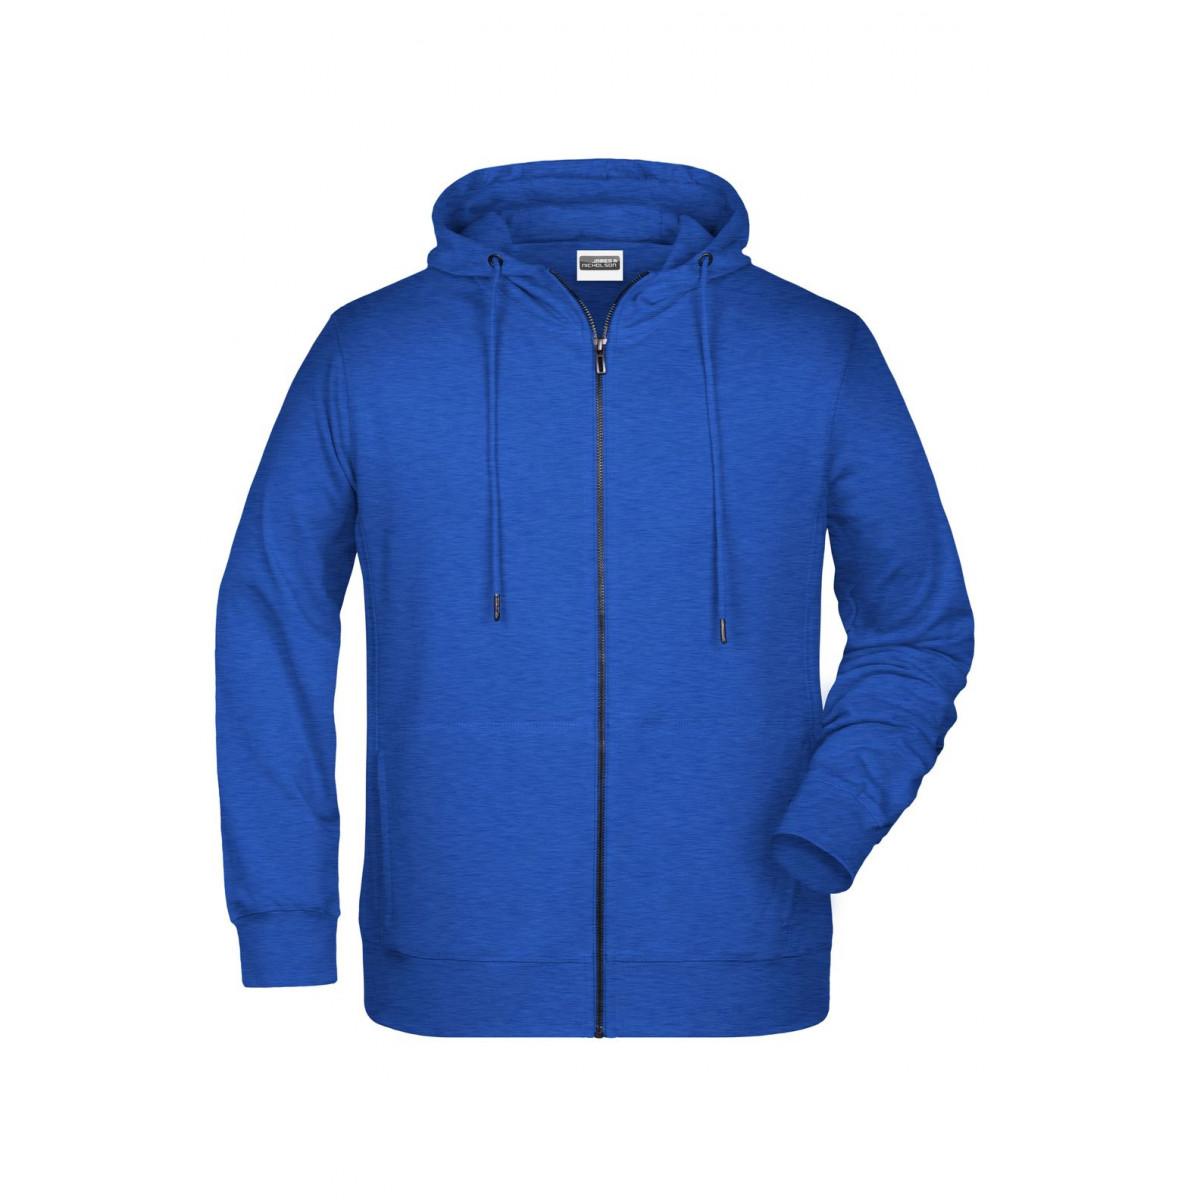 Толстовка мужская 8026 Mens Zip Hoody - Ярко-синий меоанж